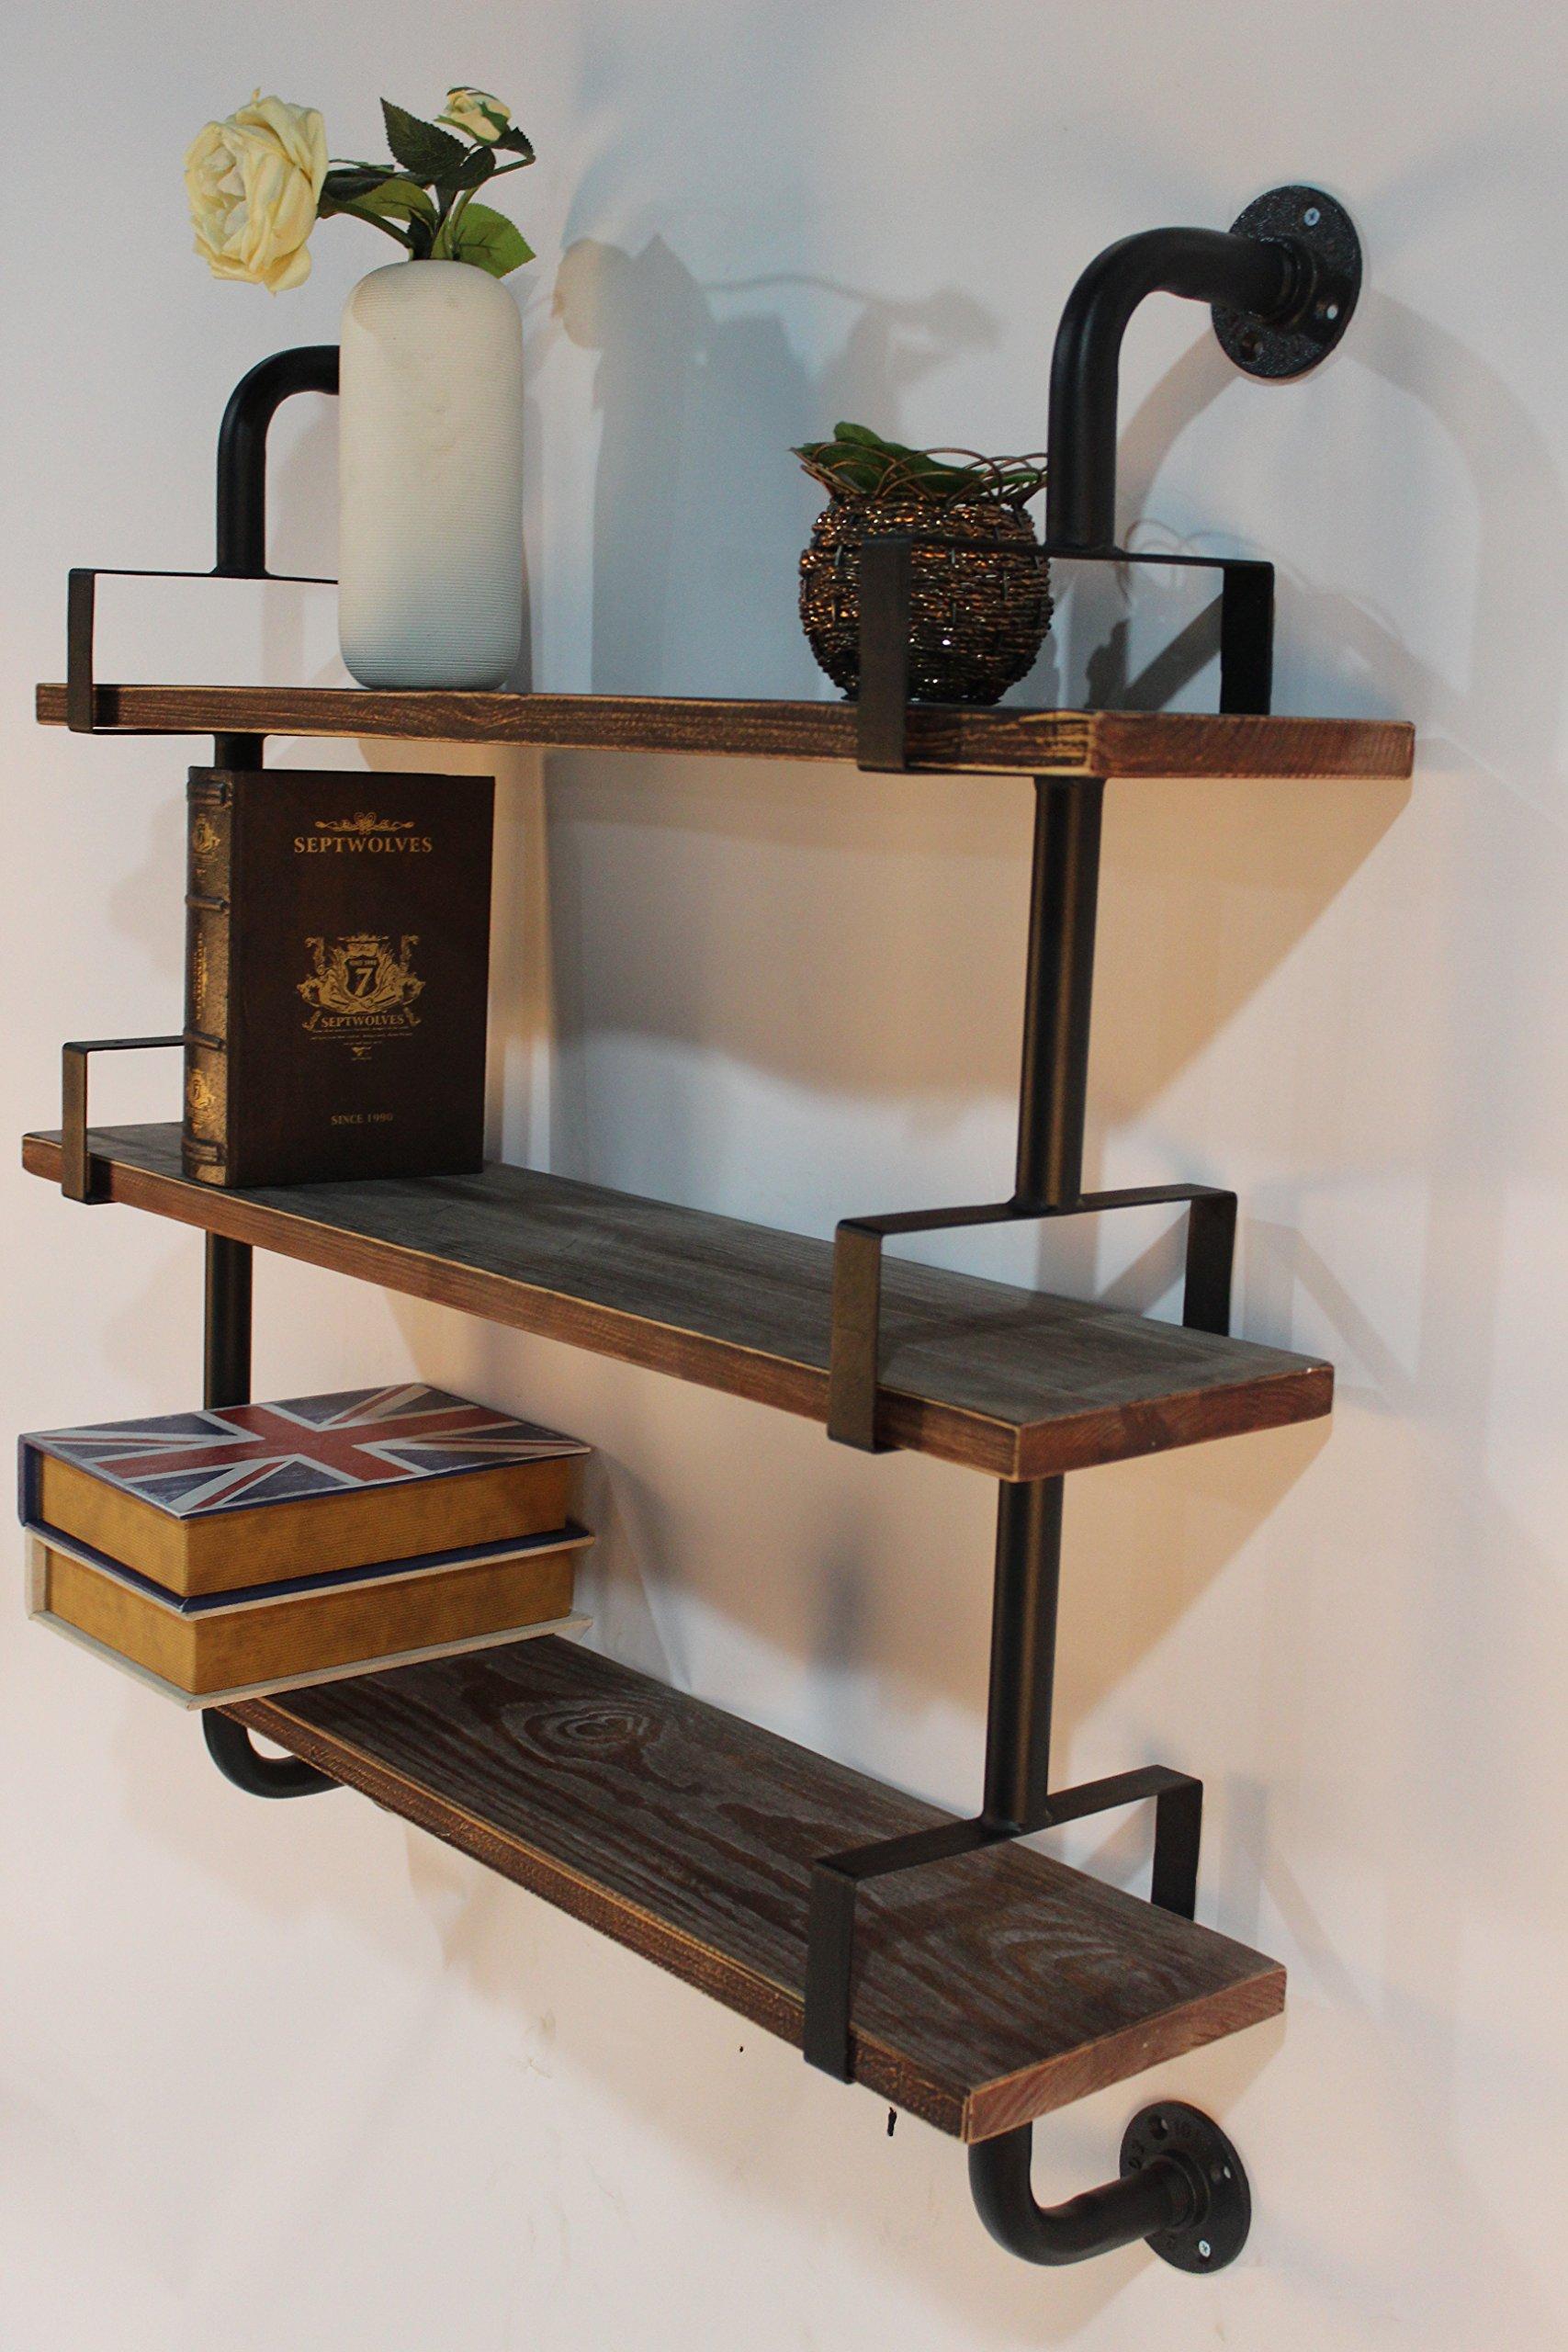 Reclaimed Wood & Industrial DIY Pipes Shelves Steampunk Rustic Urban Pipe Shelf 24''